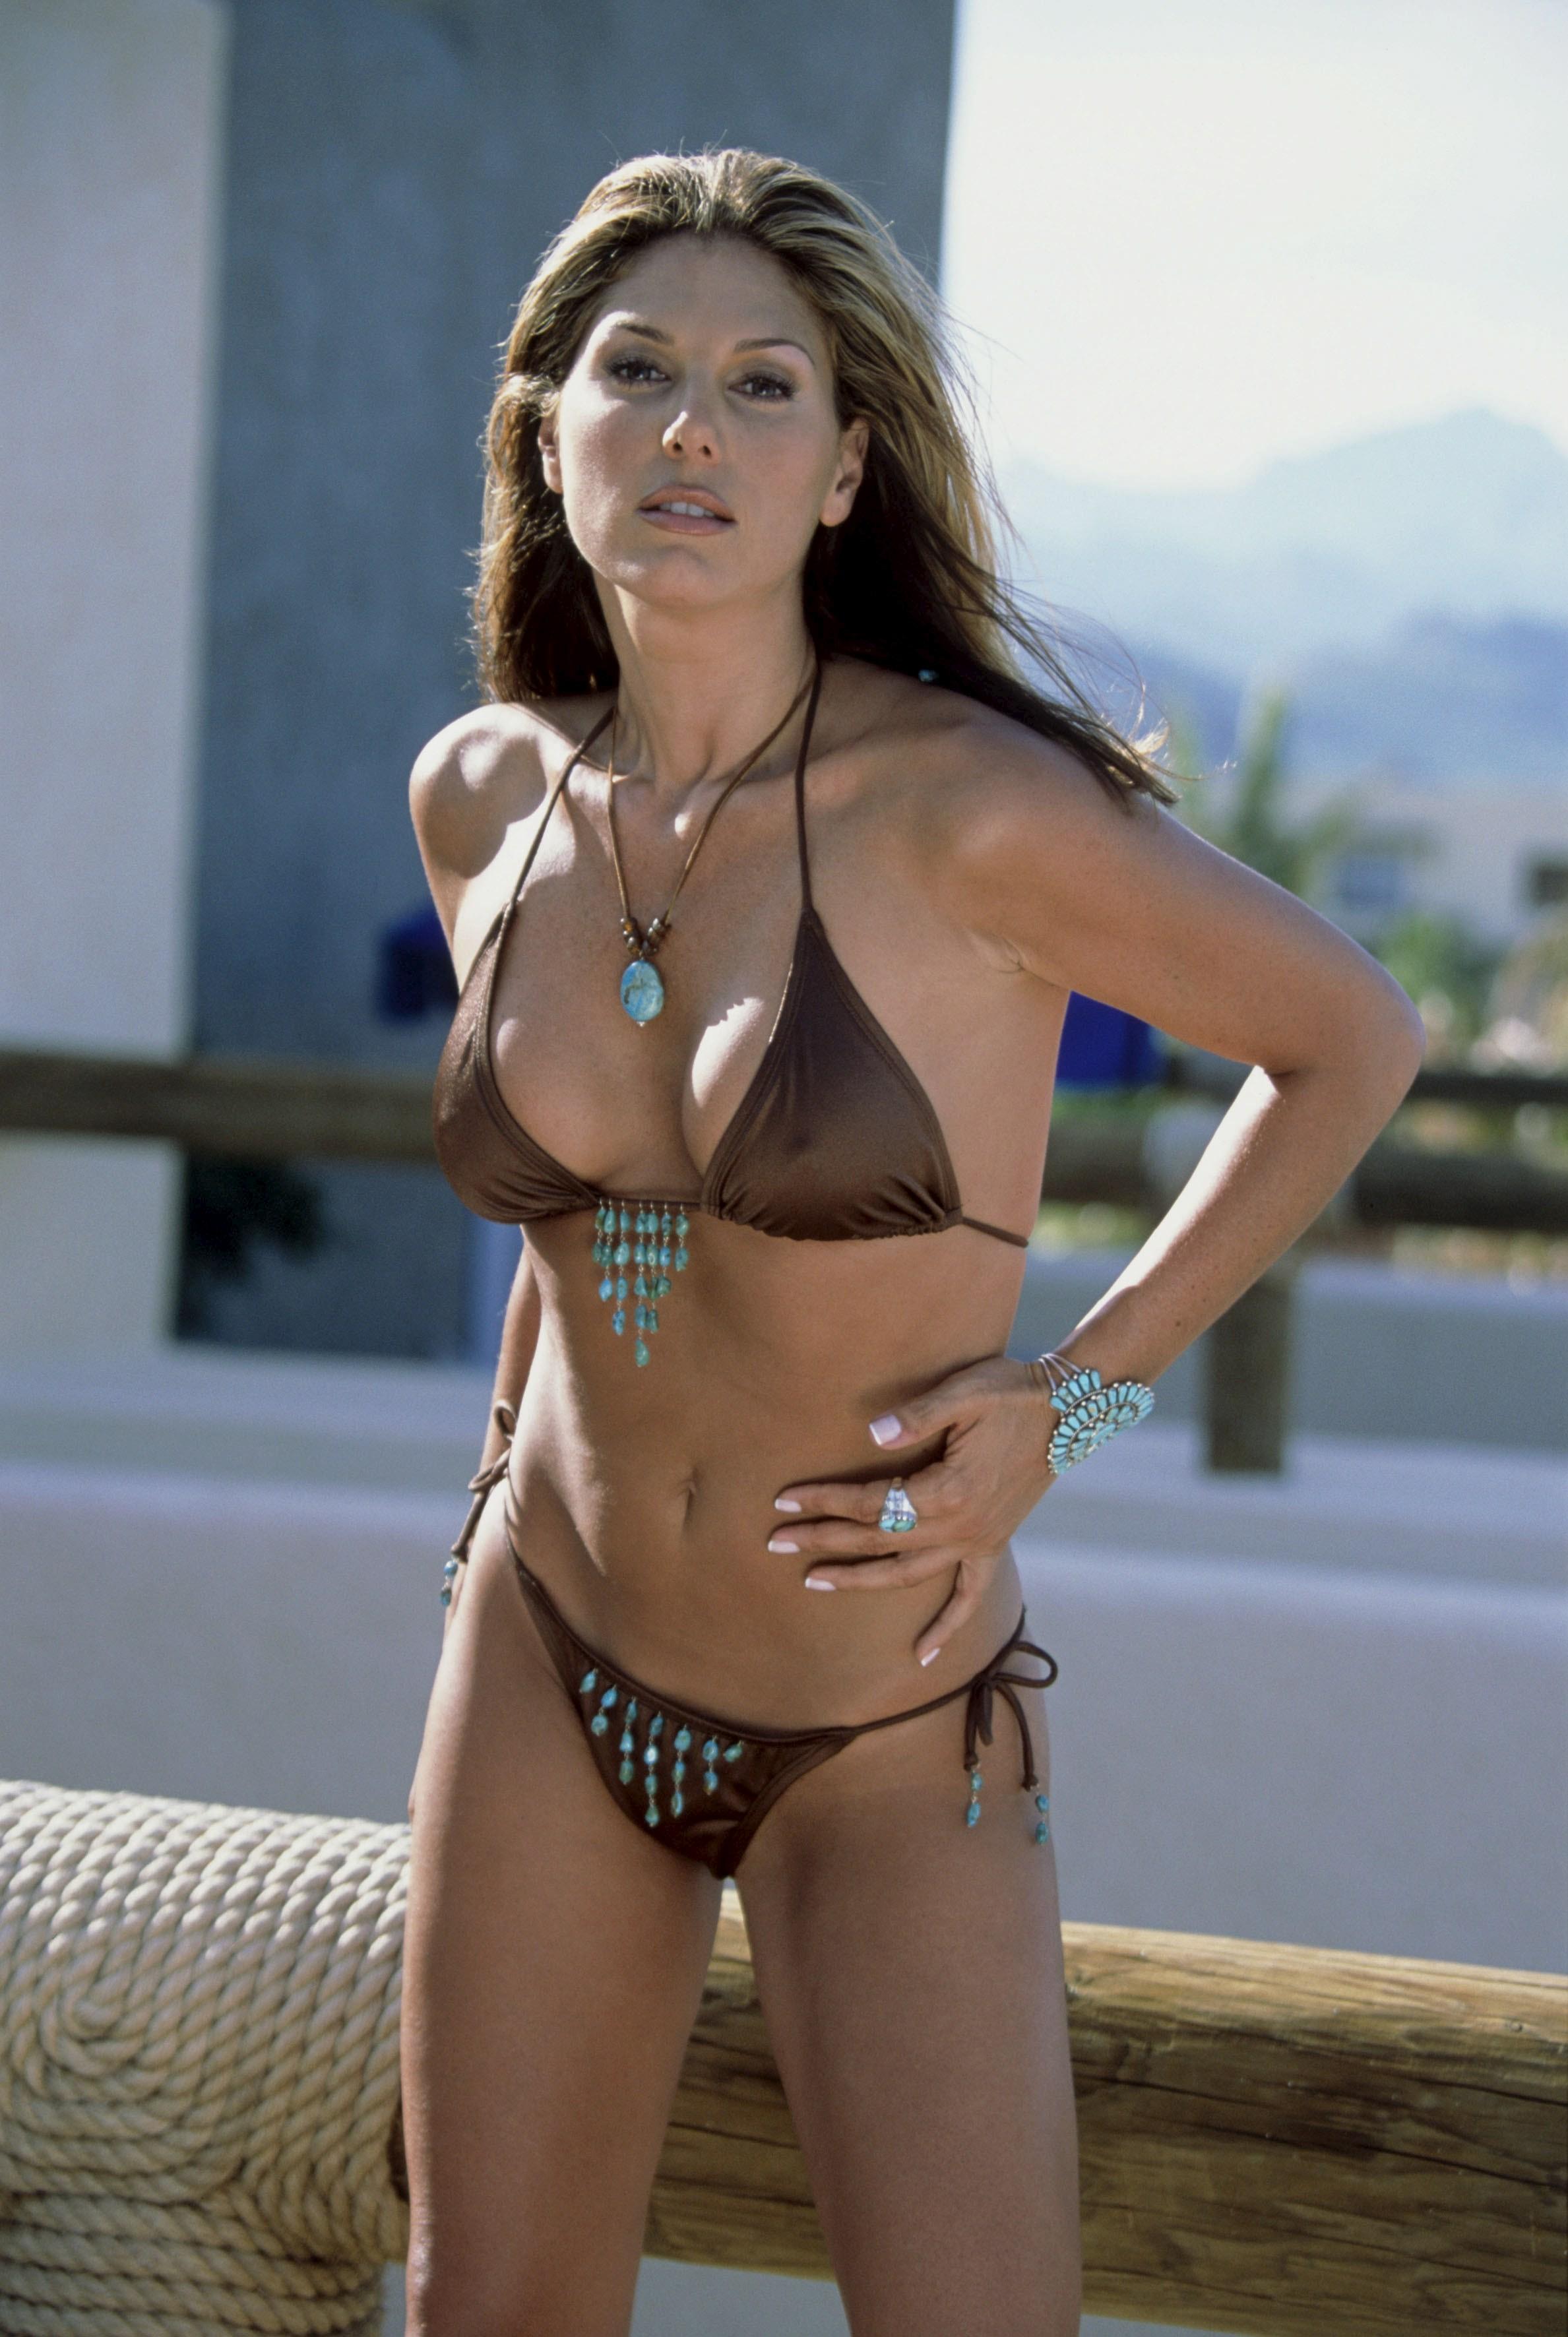 46330_Daisey_Fuentes_bikini_08_122_777lo.jpg